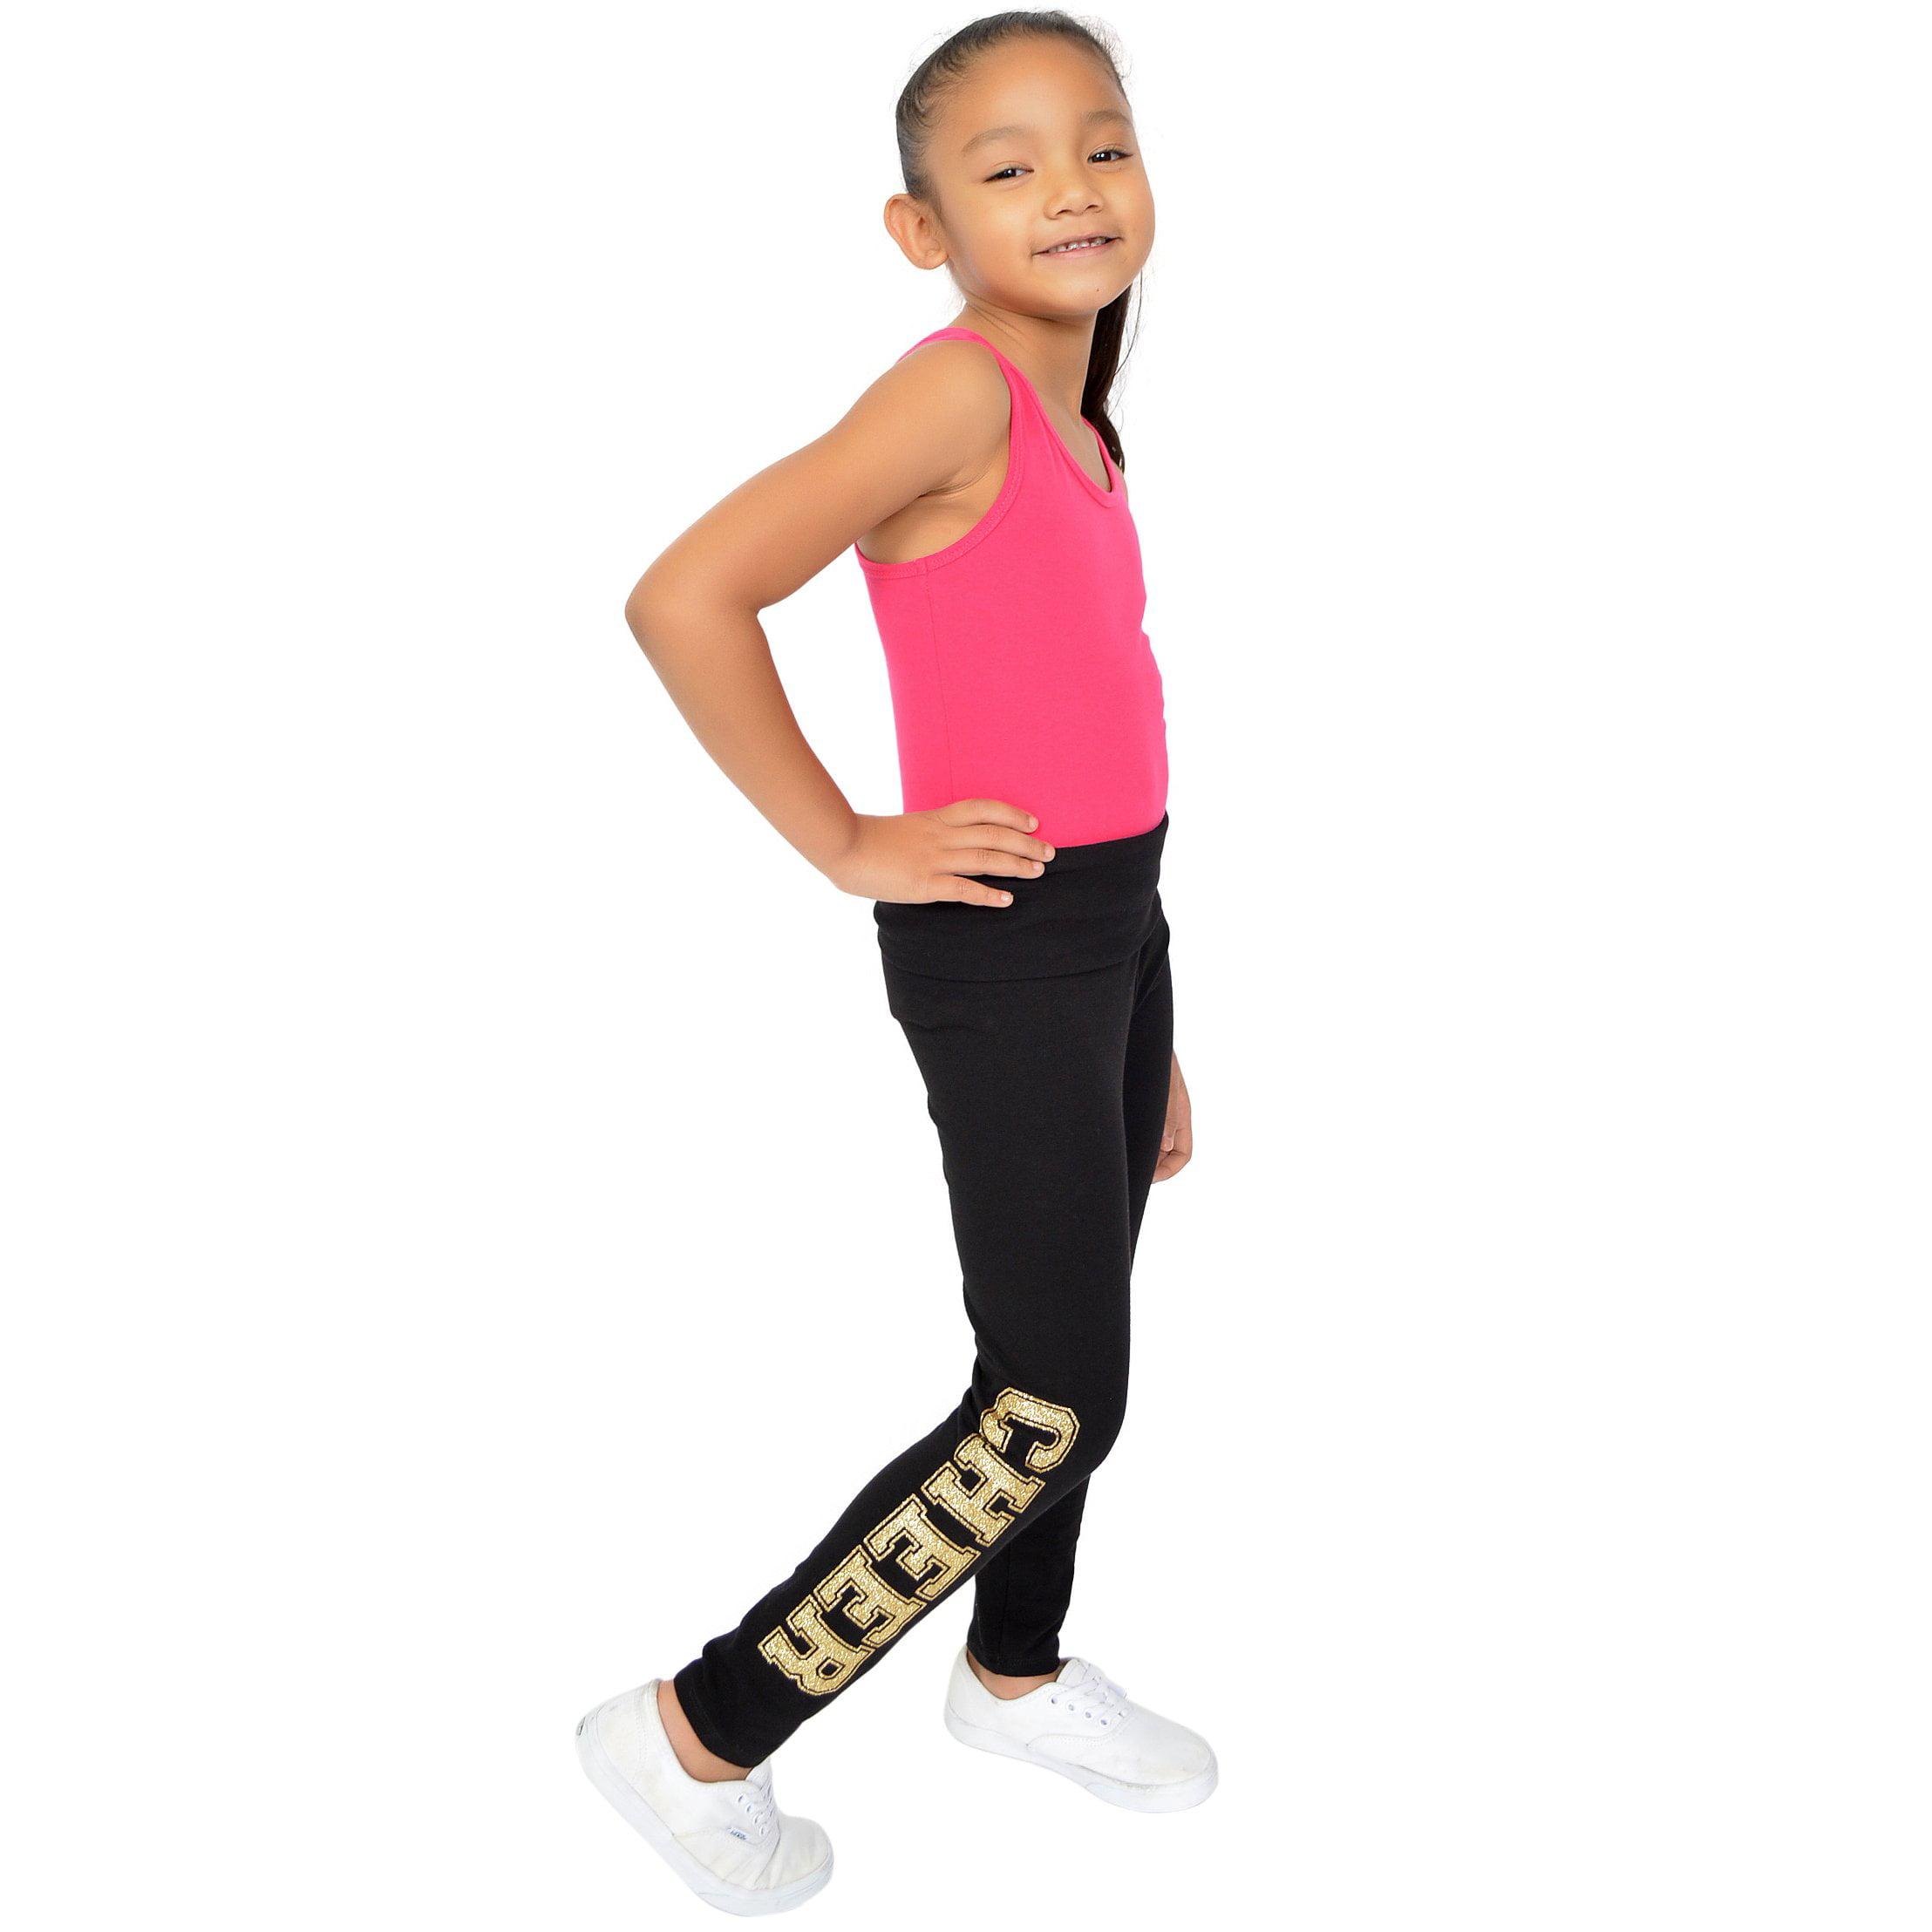 f6c0170bf2e7d Stretch Is Comfort - Teamwear Girl's Women's Plus Size Gold Glitter Cheer  Spirit Foldover Leggings - Large Child (10) / Black - Walmart.com